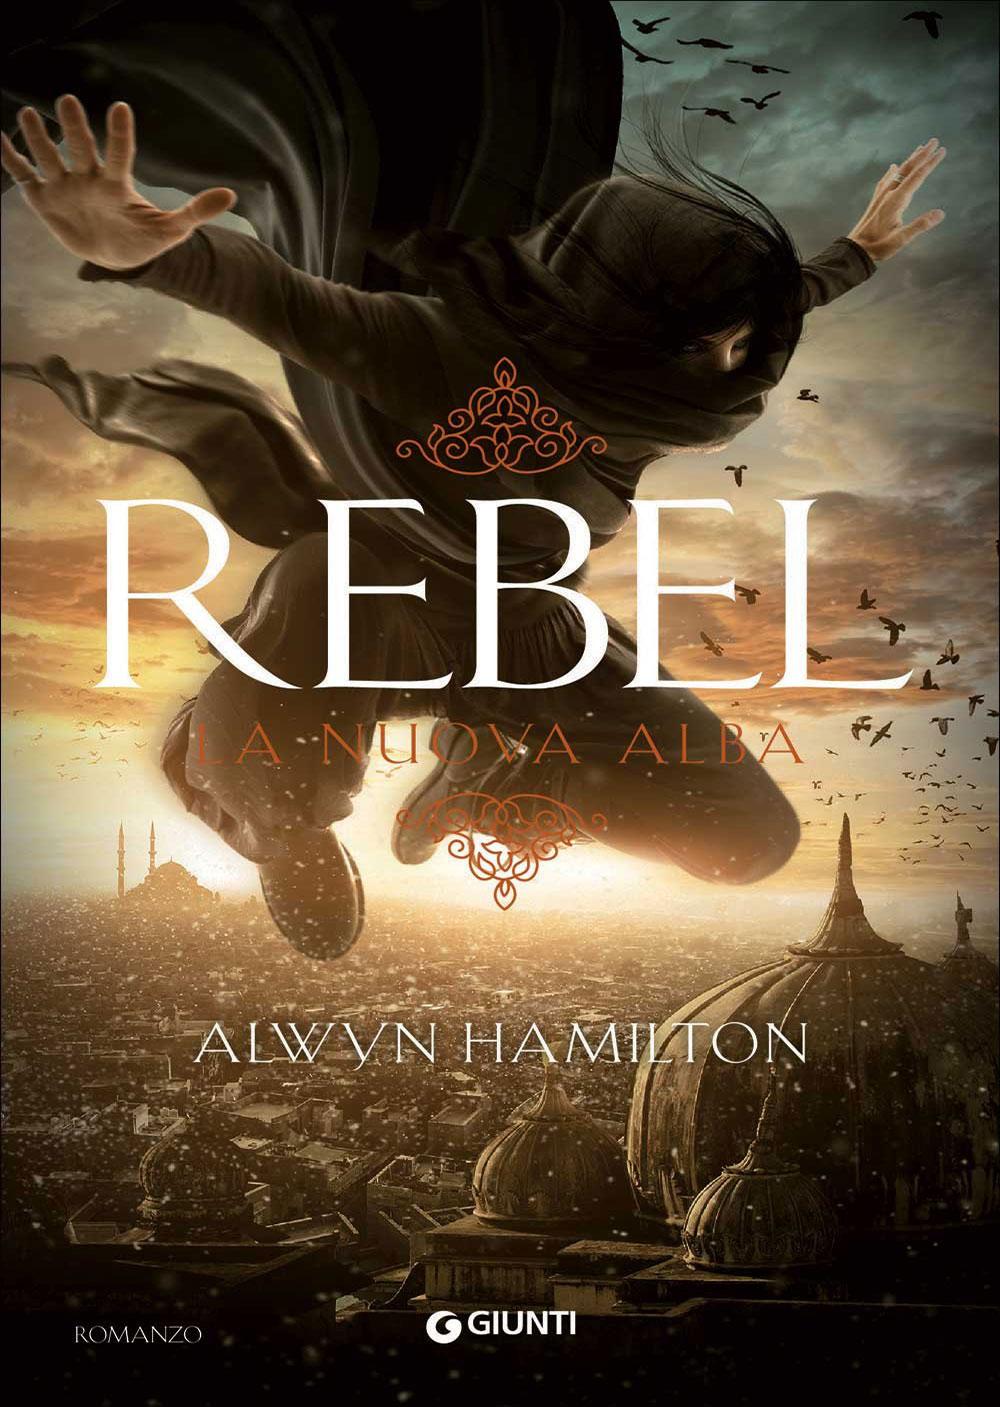 Recensioni 2017: Rebel. La nuova alba